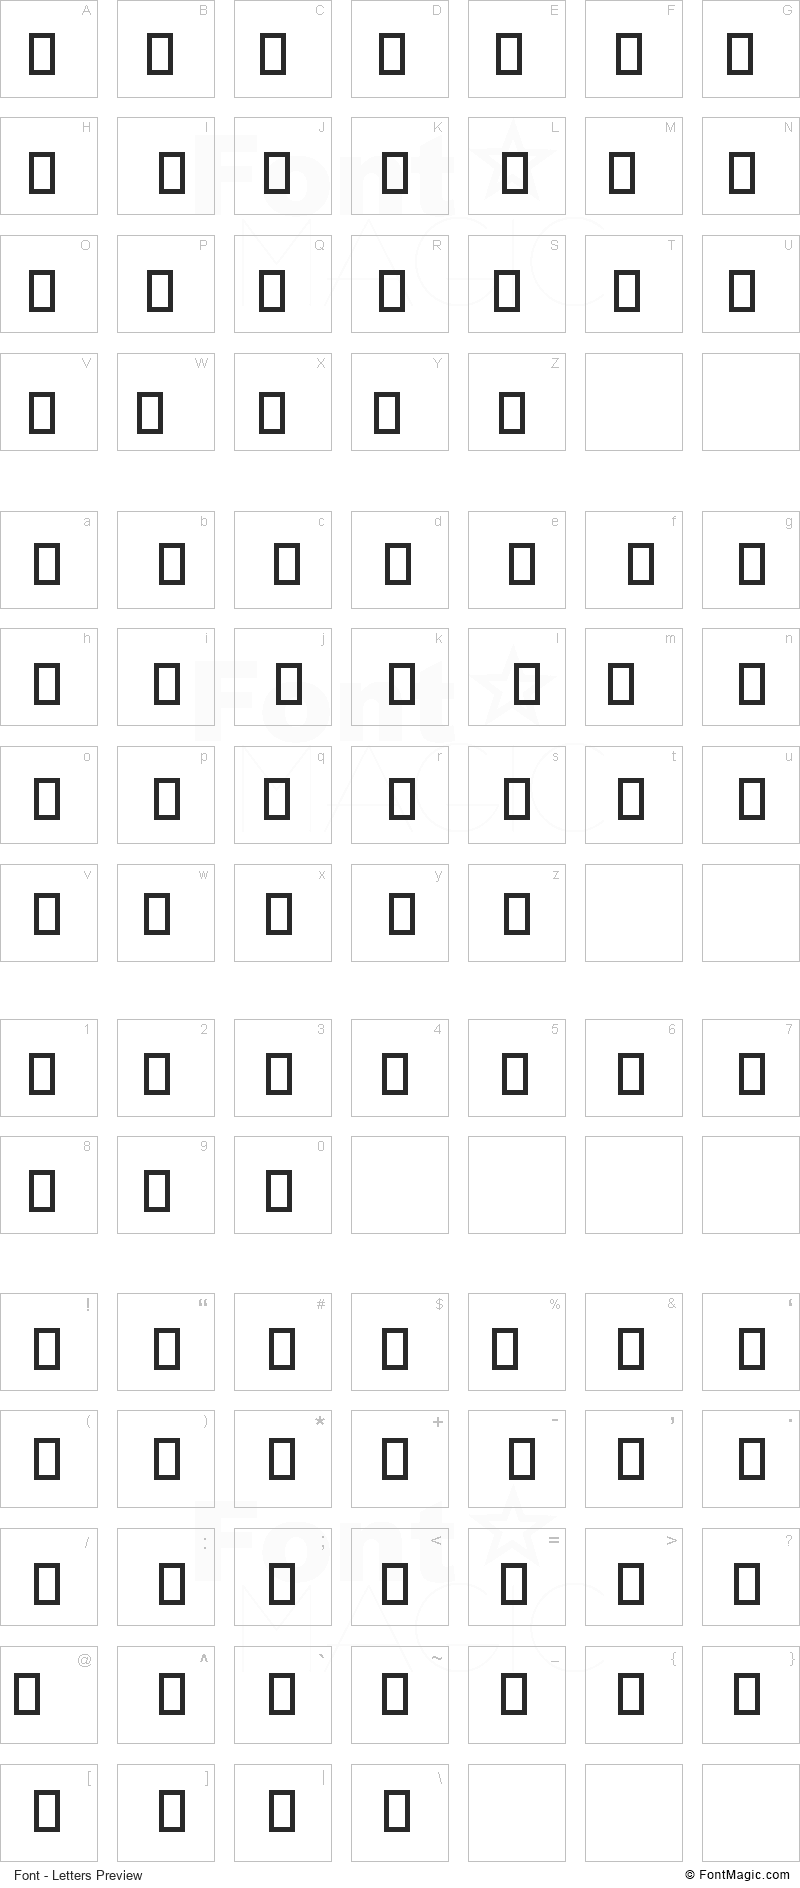 Dictators Font - All Latters Preview Chart